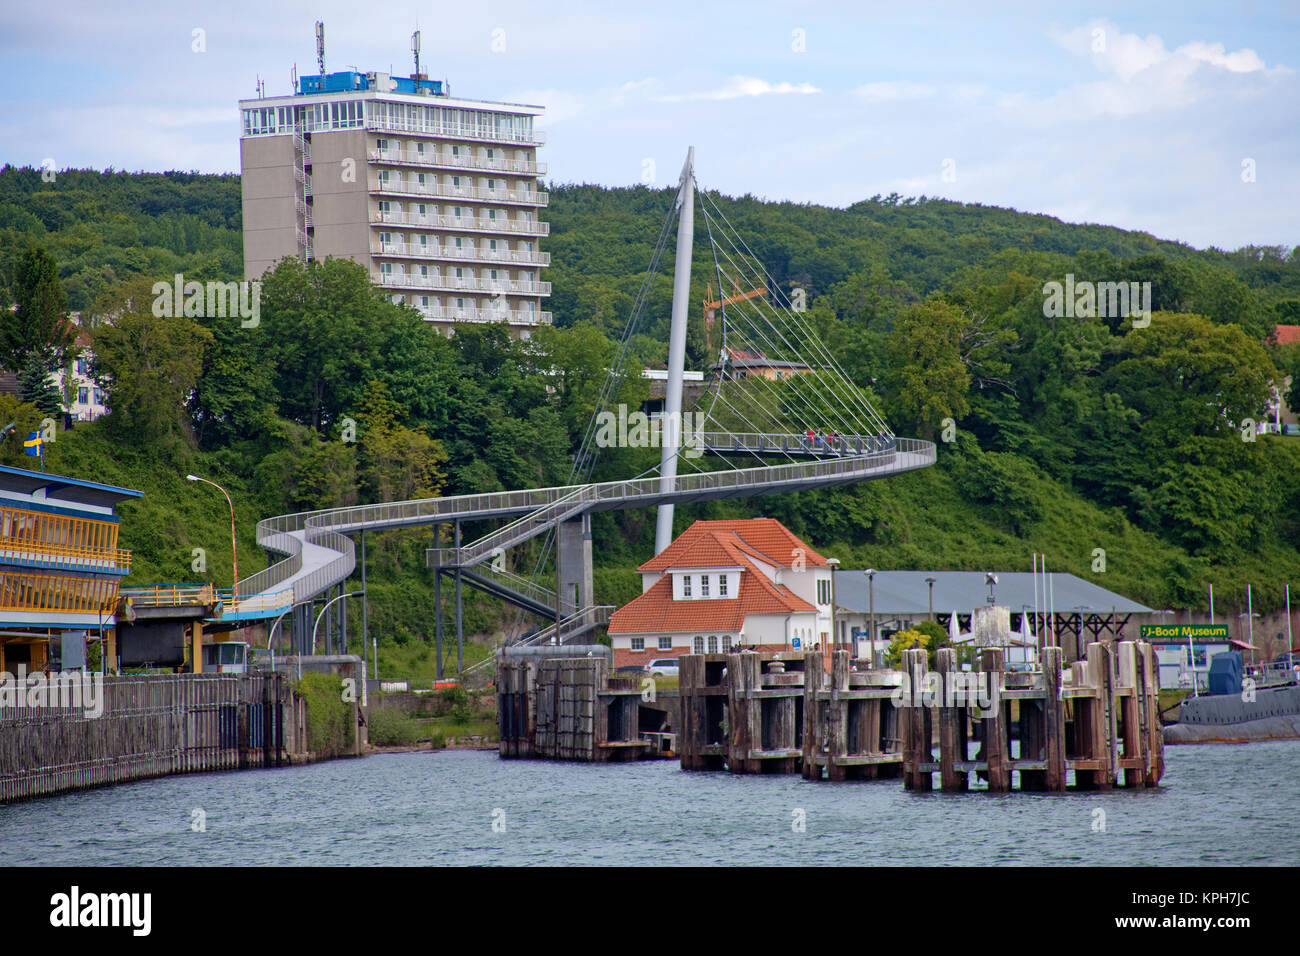 Hotel Ruegen and pedestrian bridge, connect city with harbour, Sassnitz, Ruegen island, Mecklenburg-Western Pomerania, Stock Photo